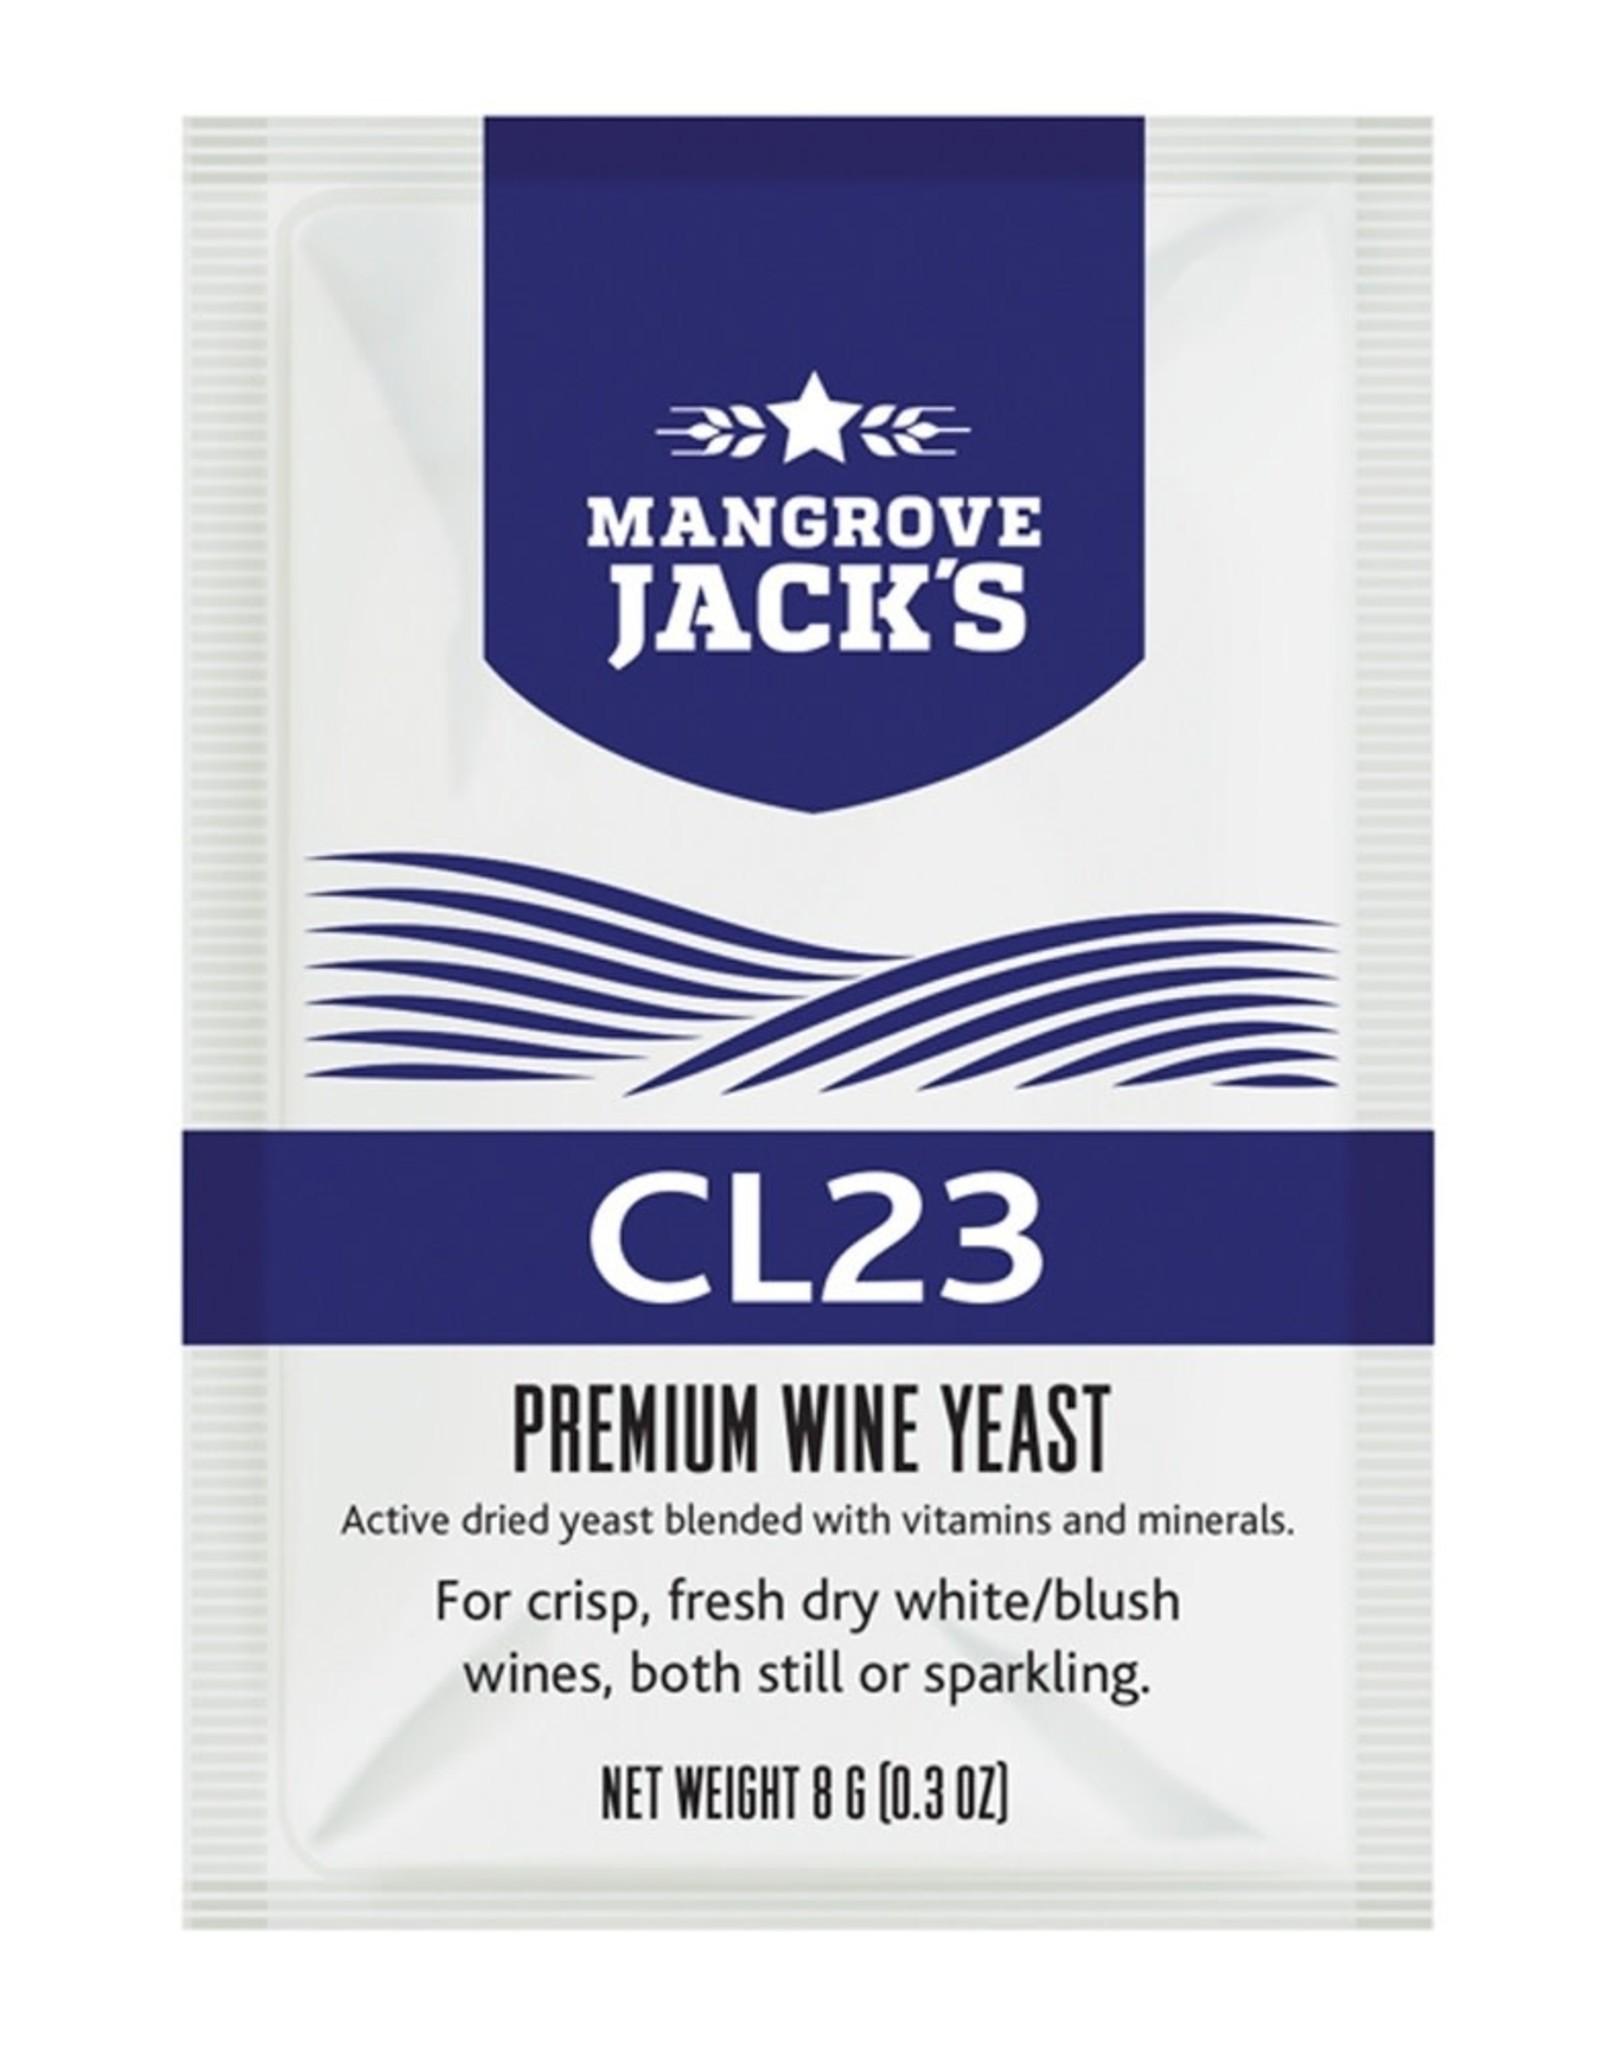 MANGROVE CL23 MANGROVE JACK YEAST WINE 8g